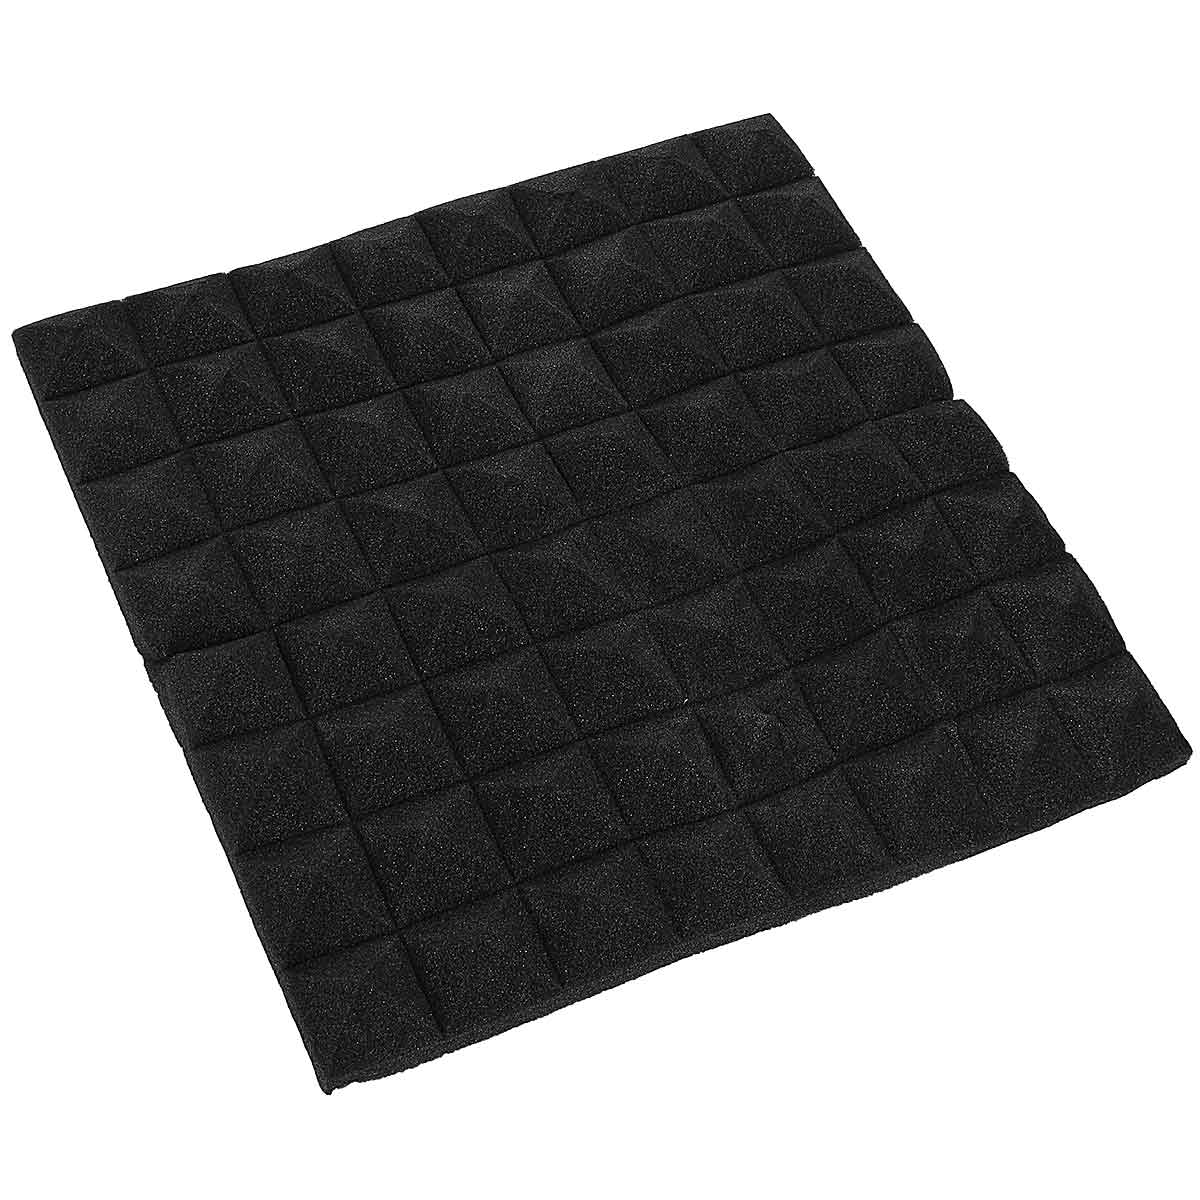 50x50x5cm Acoustic Soundproof Foam Sound Stop Absorption